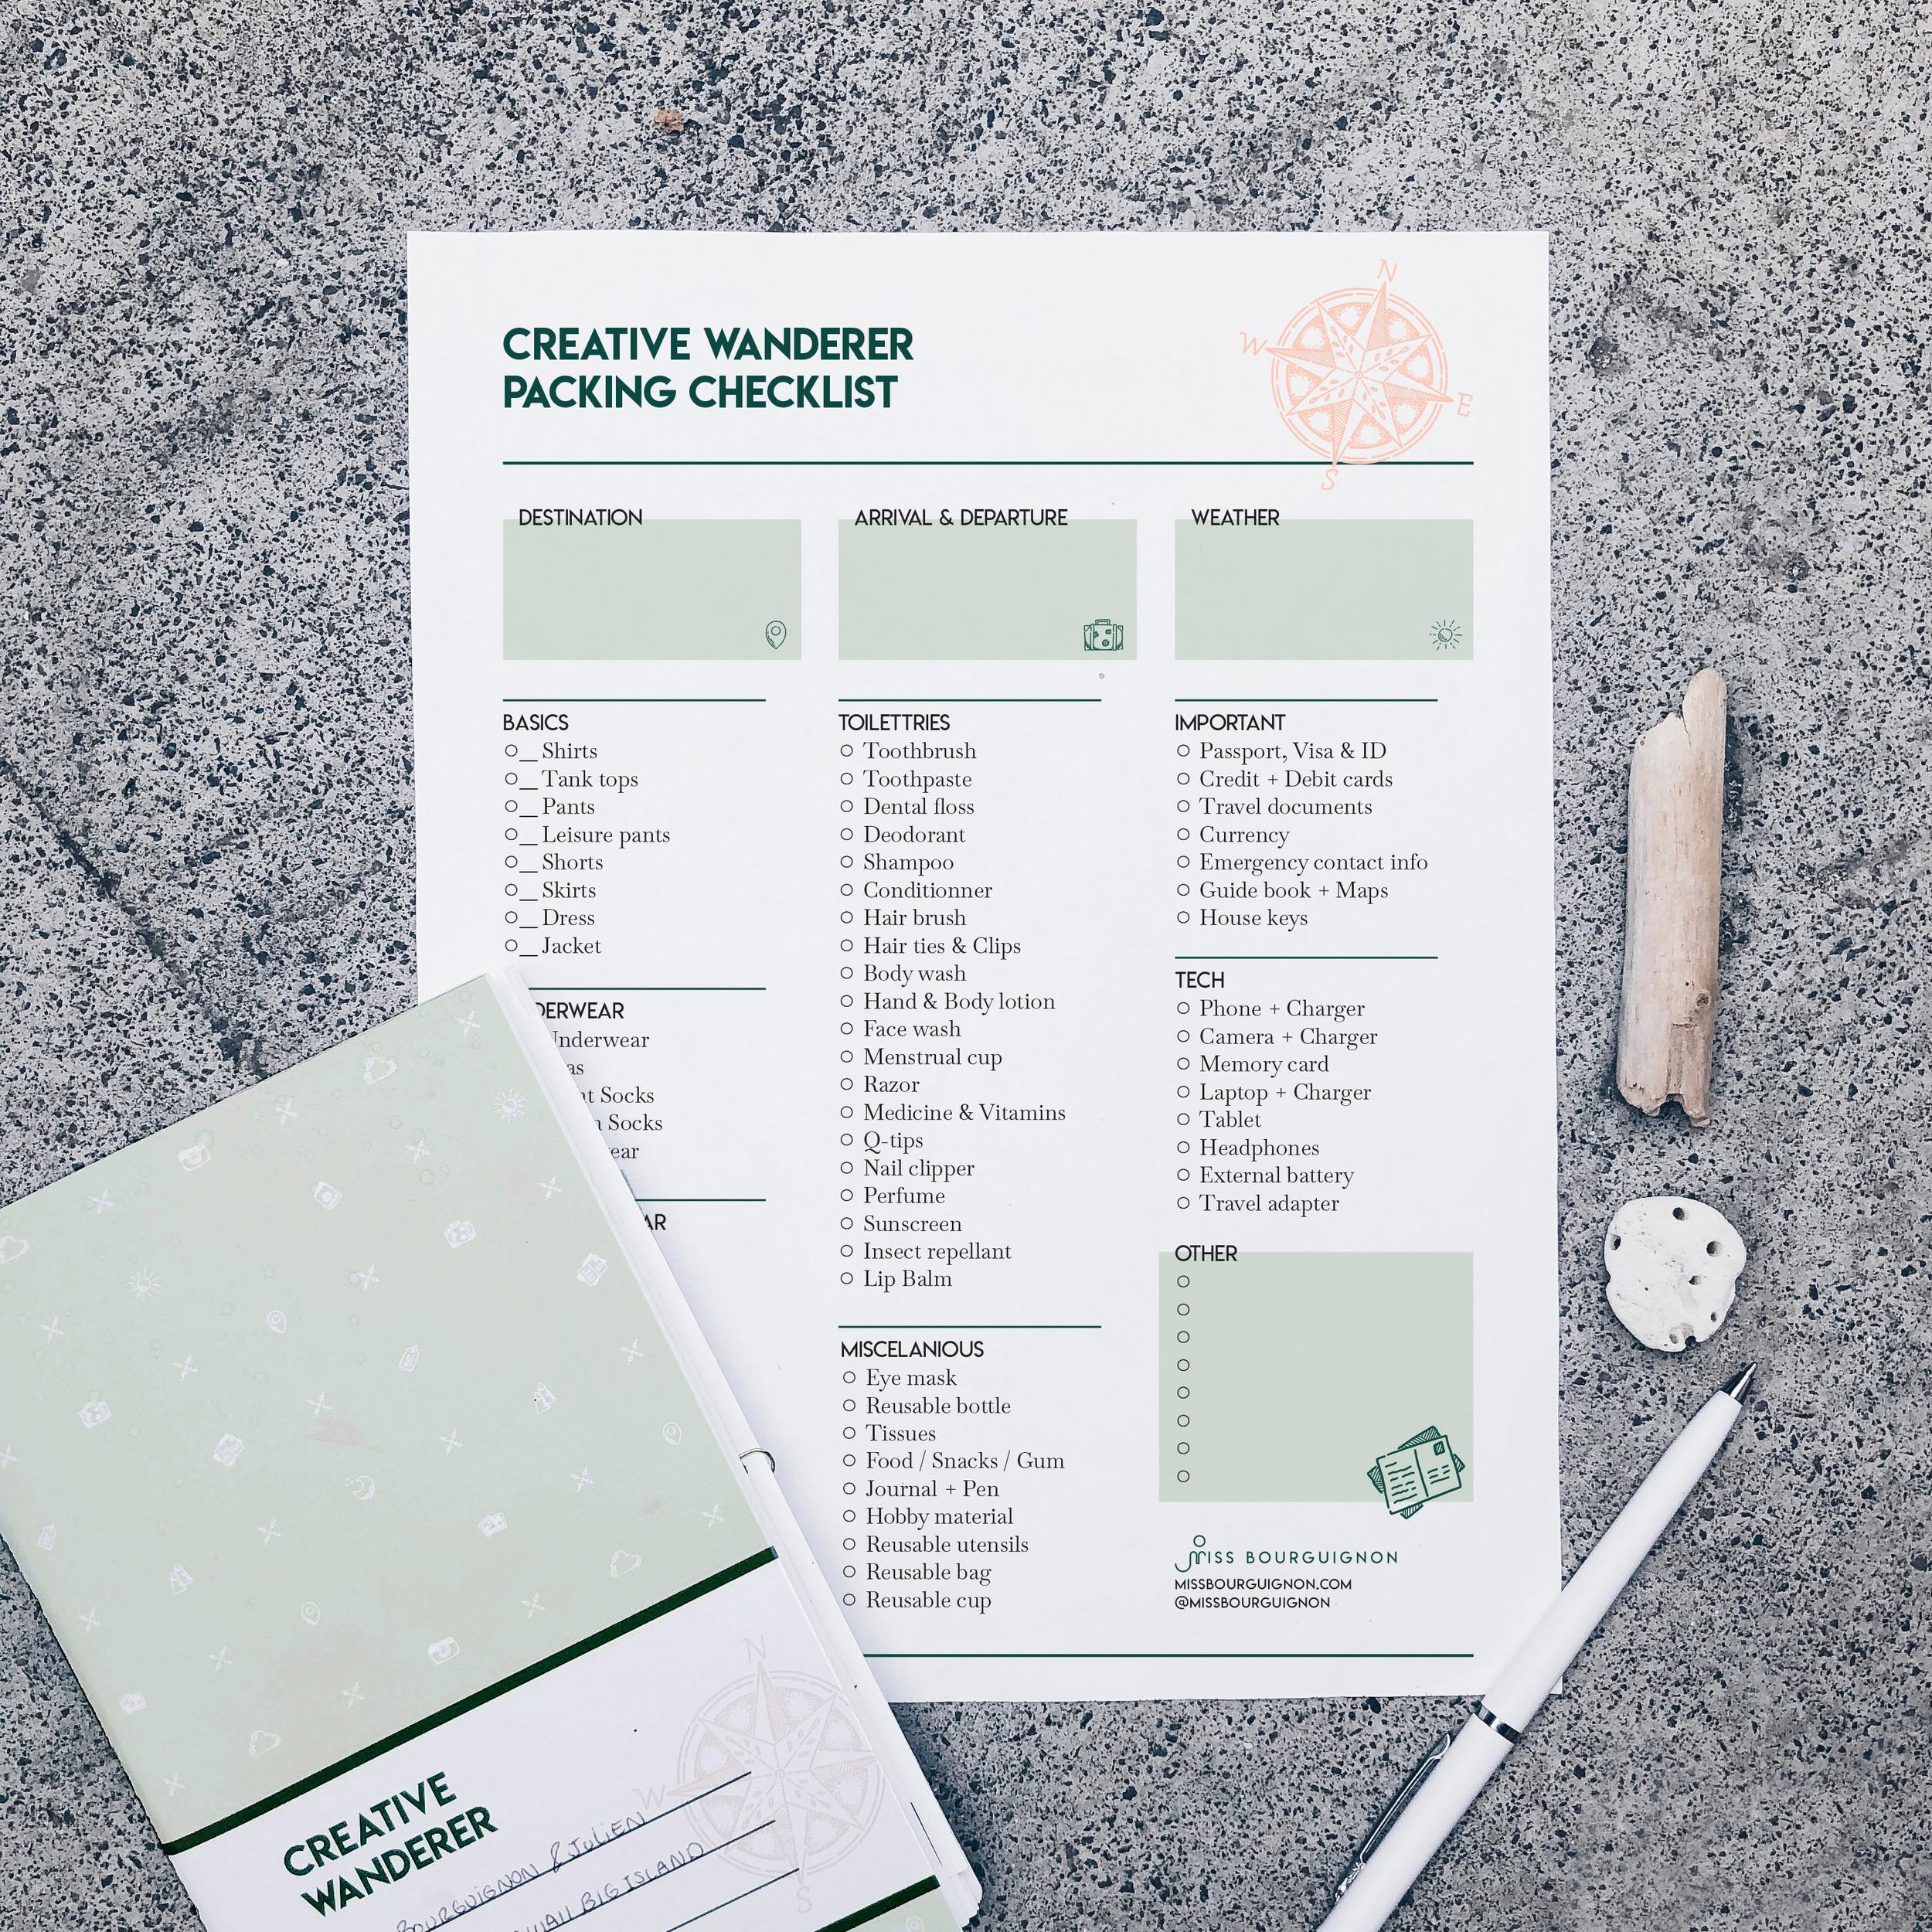 Creative_Wanderer_Packing_Checklist.jpg